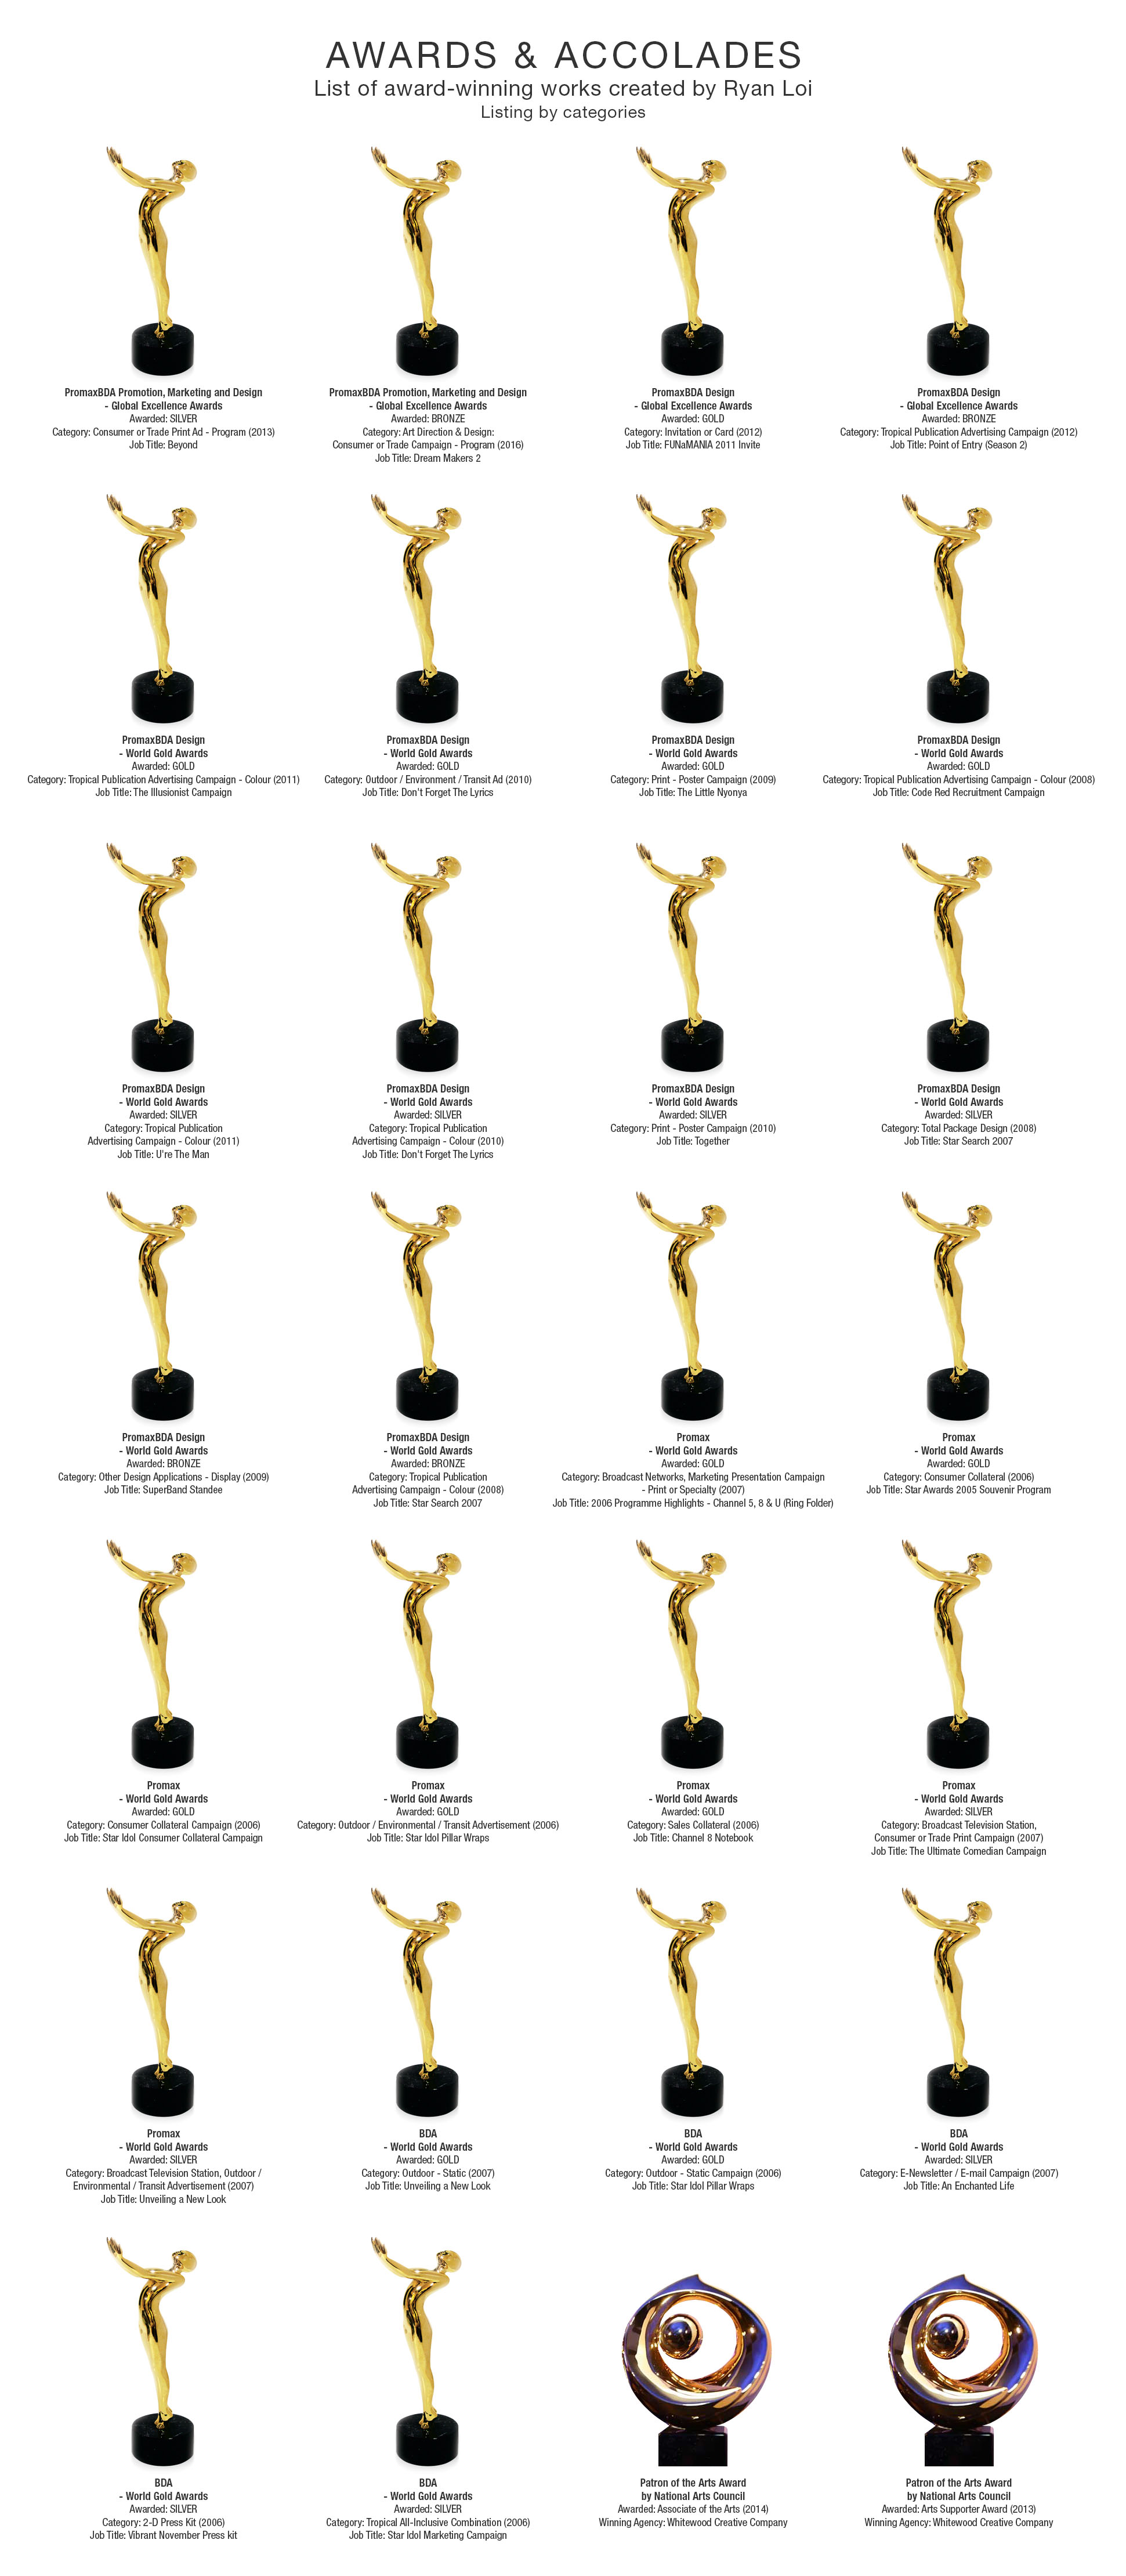 Ryan Loi Awards